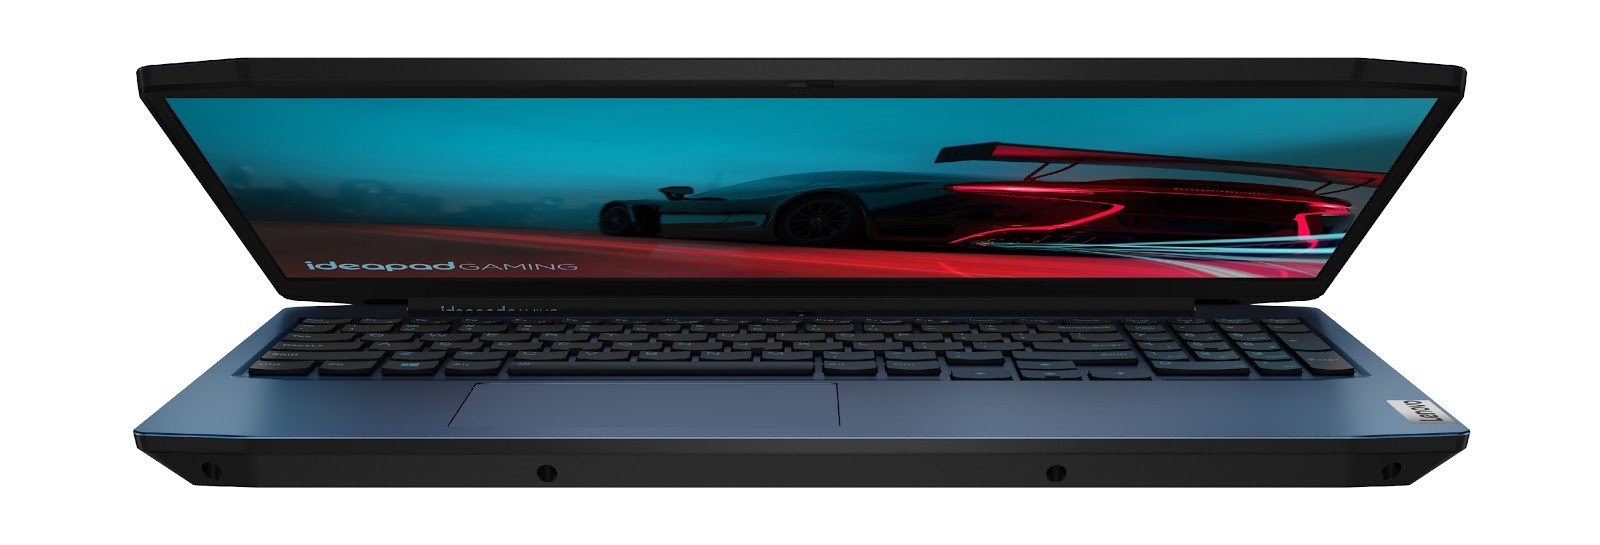 Фото 1. Ноутбук Lenovo ideapad Gaming 3 15IMH05 Chameleon Blue (81Y400L3RK)